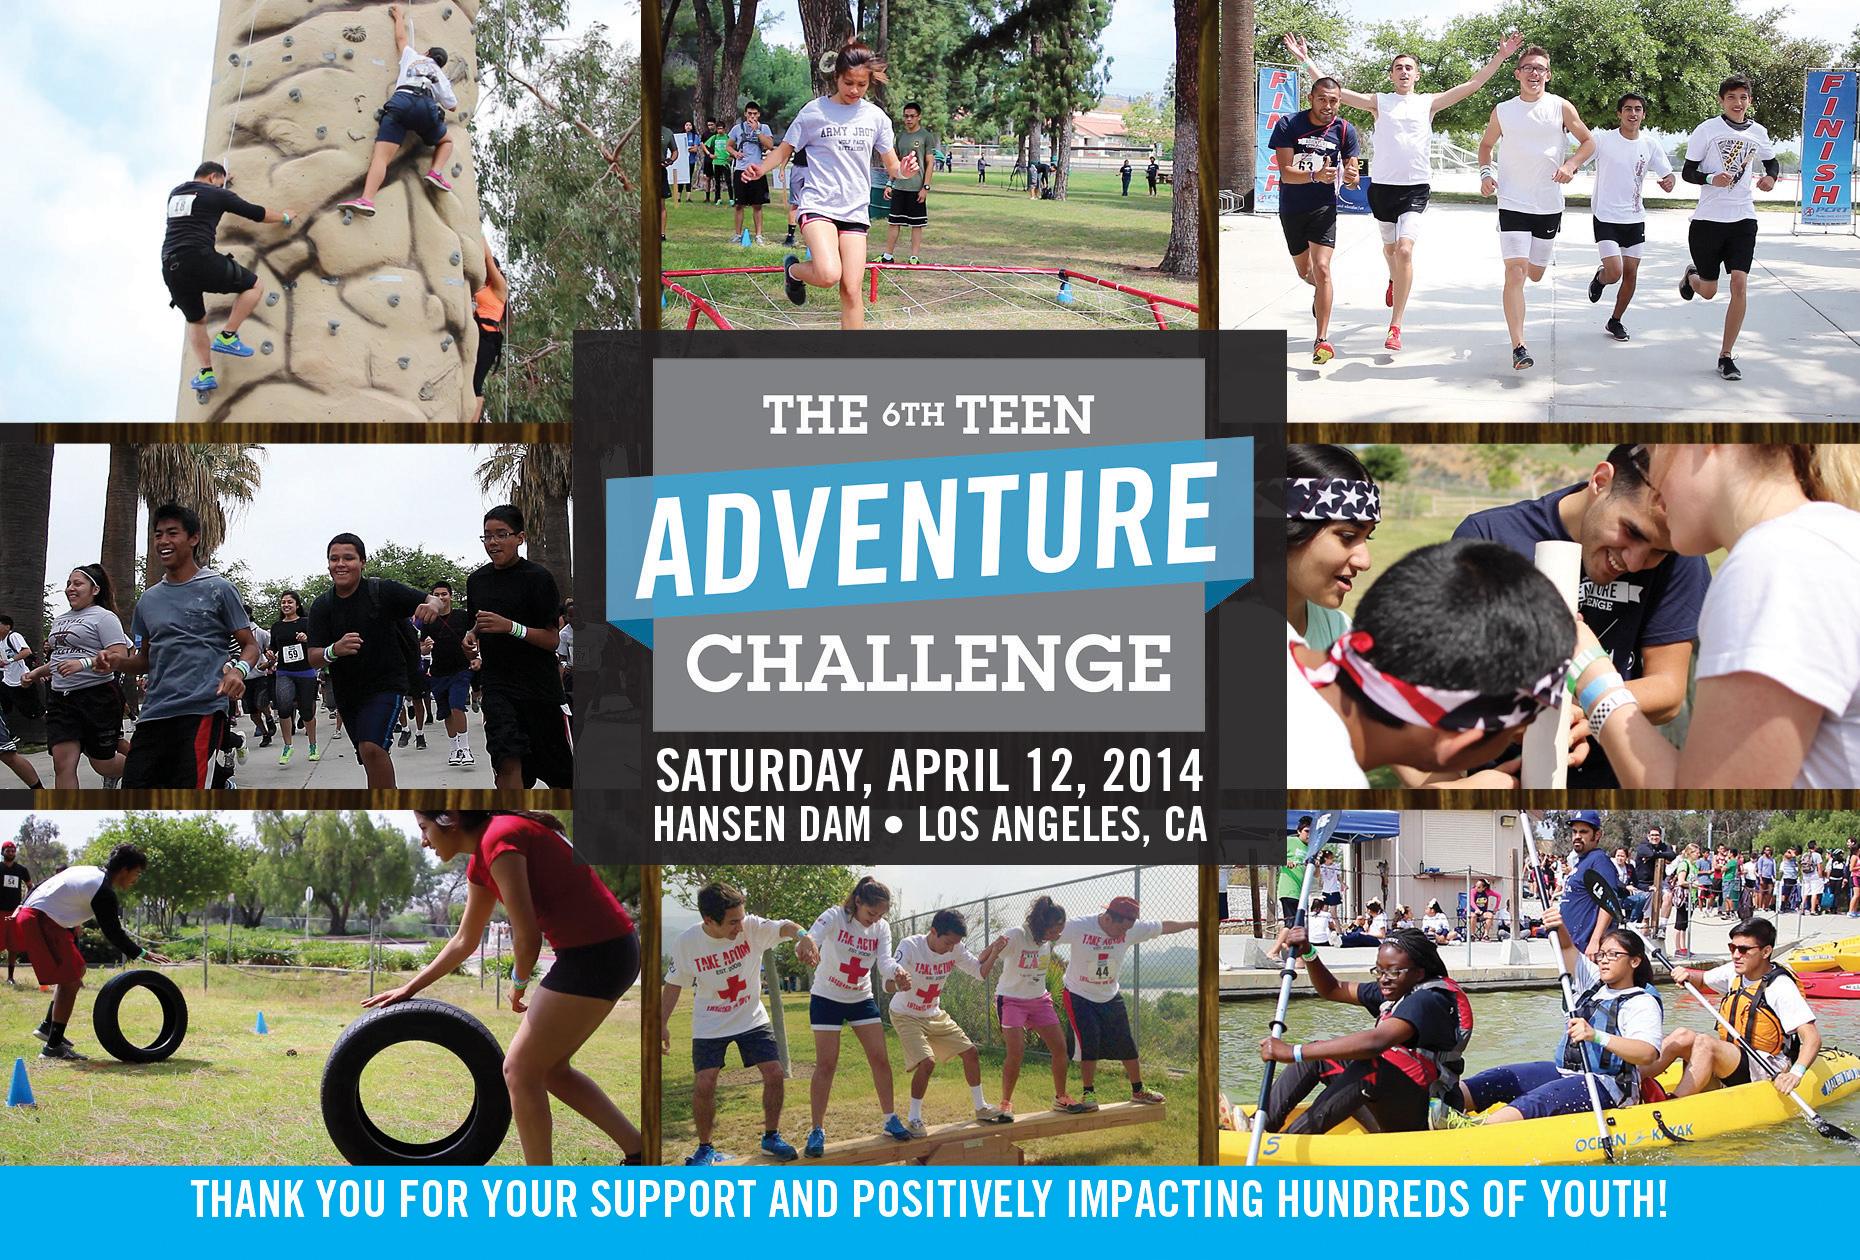 teen adventure challenge Archives - arc